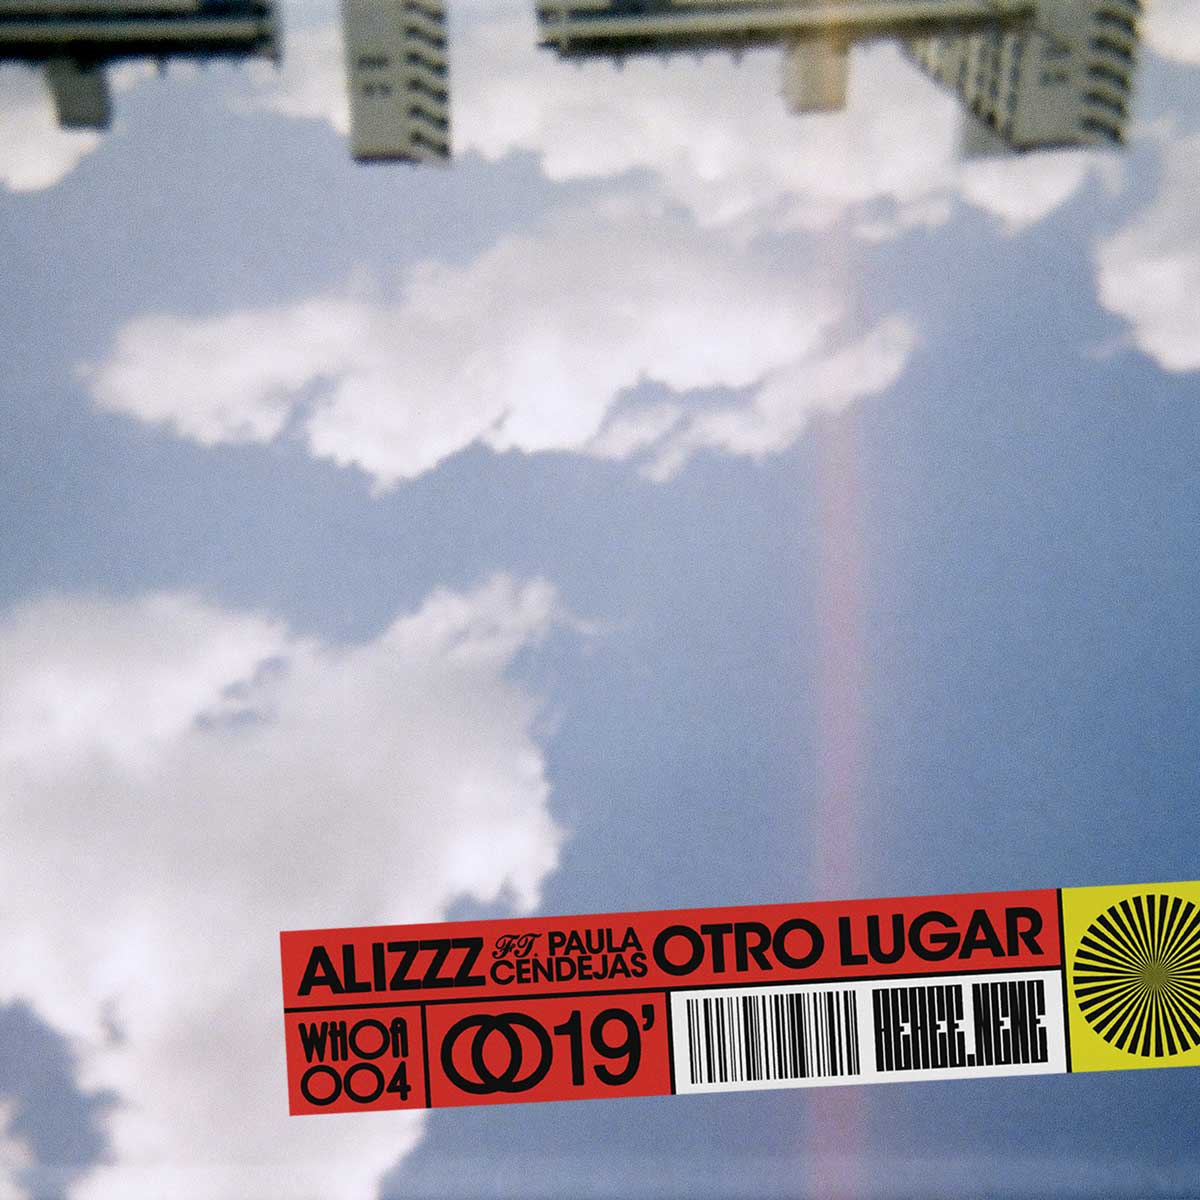 Alizzz Feat. Paula Cendejas - Otro Lugar